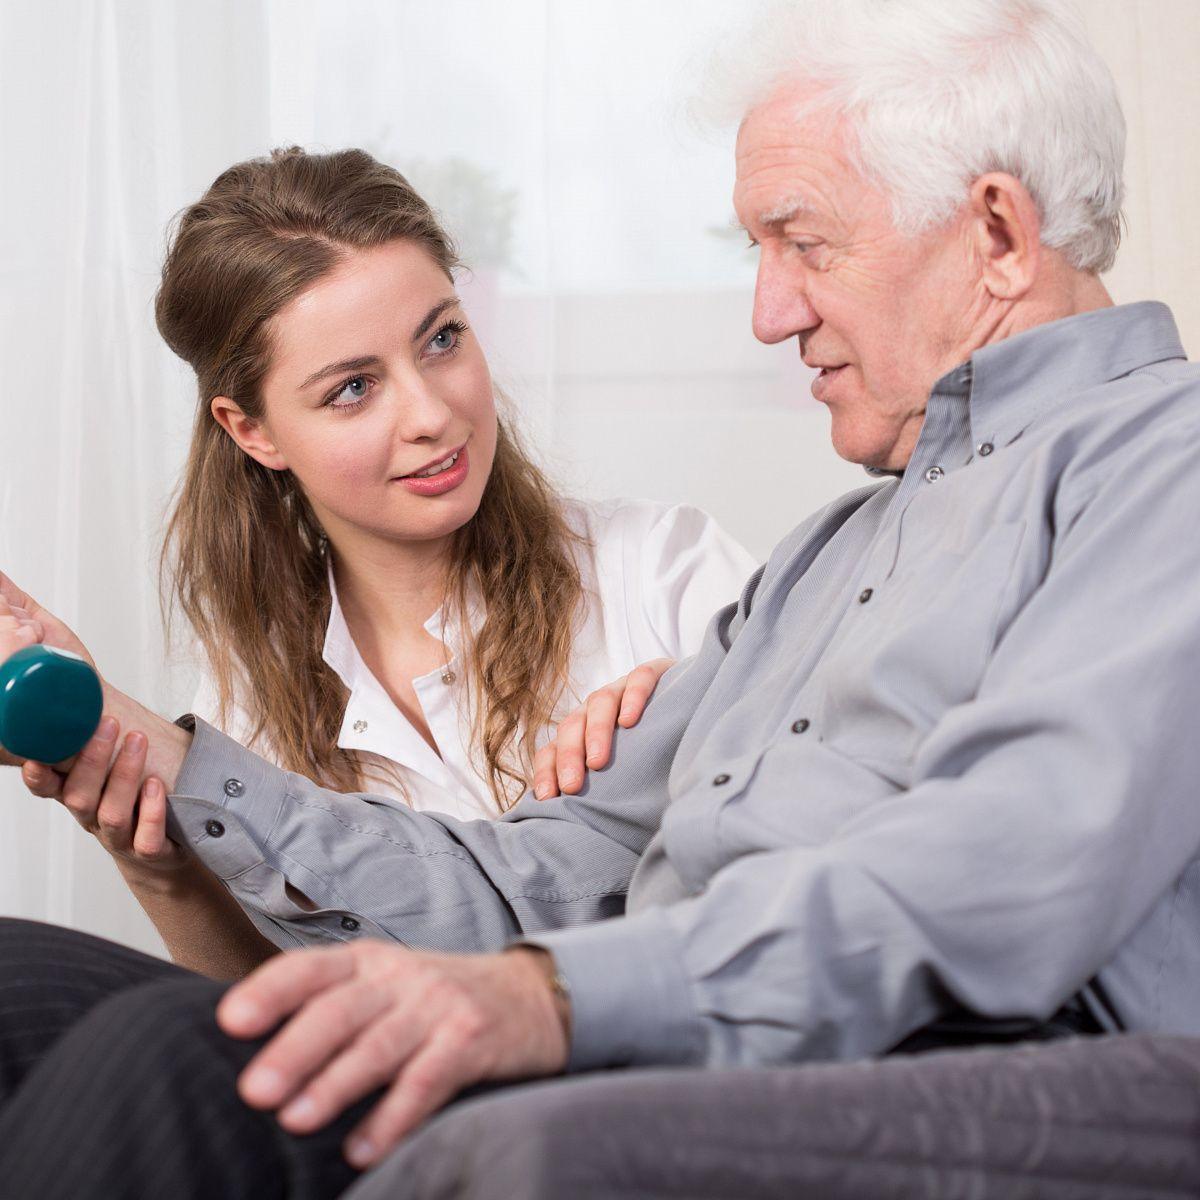 50's Plus Senior Dating Online Sites Full Free